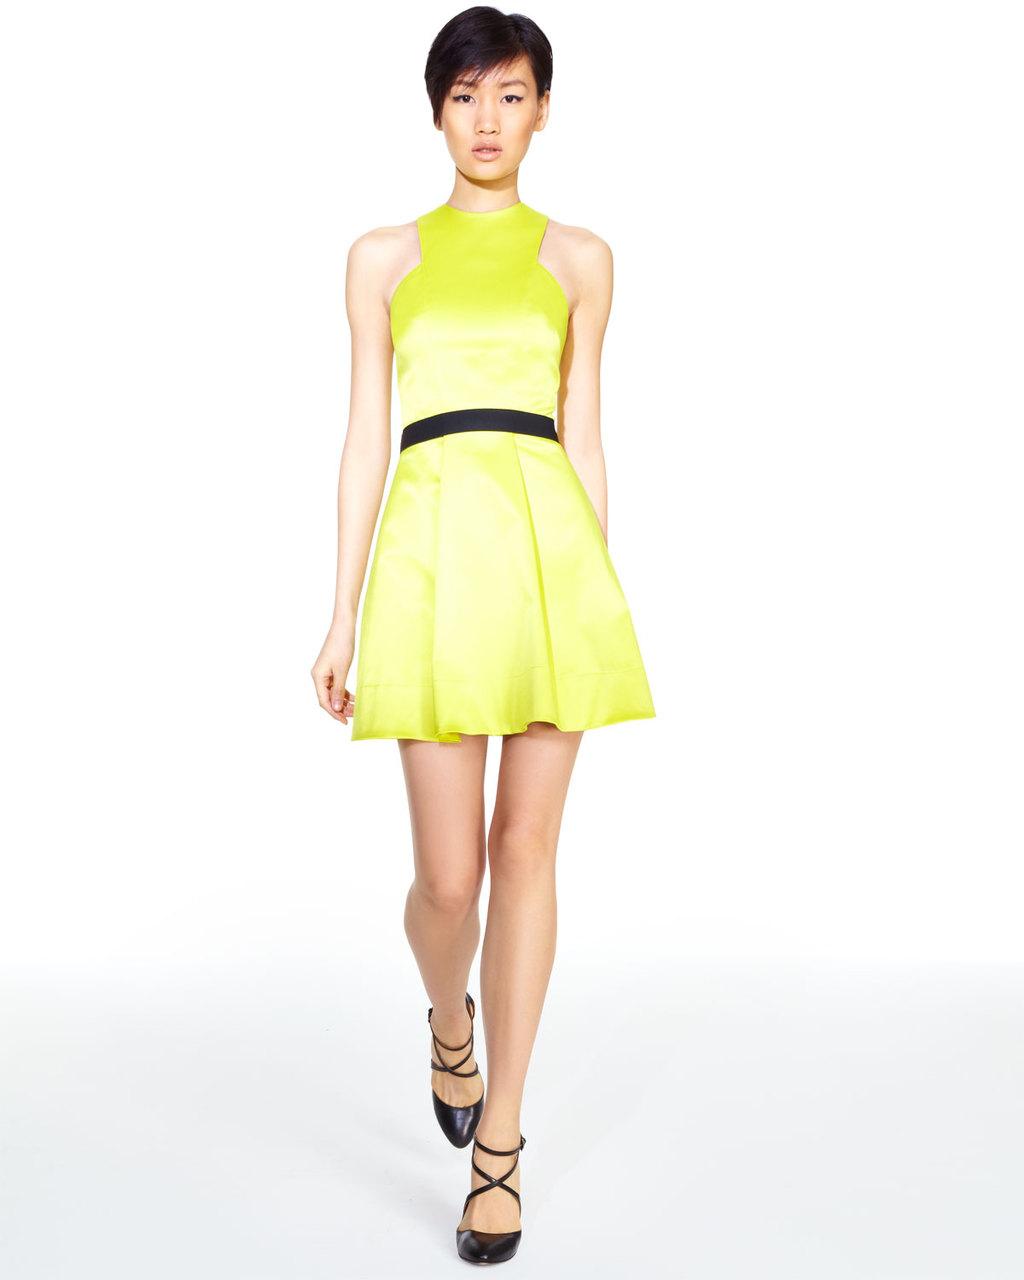 Electric yellow bridesmaid dress with black sash